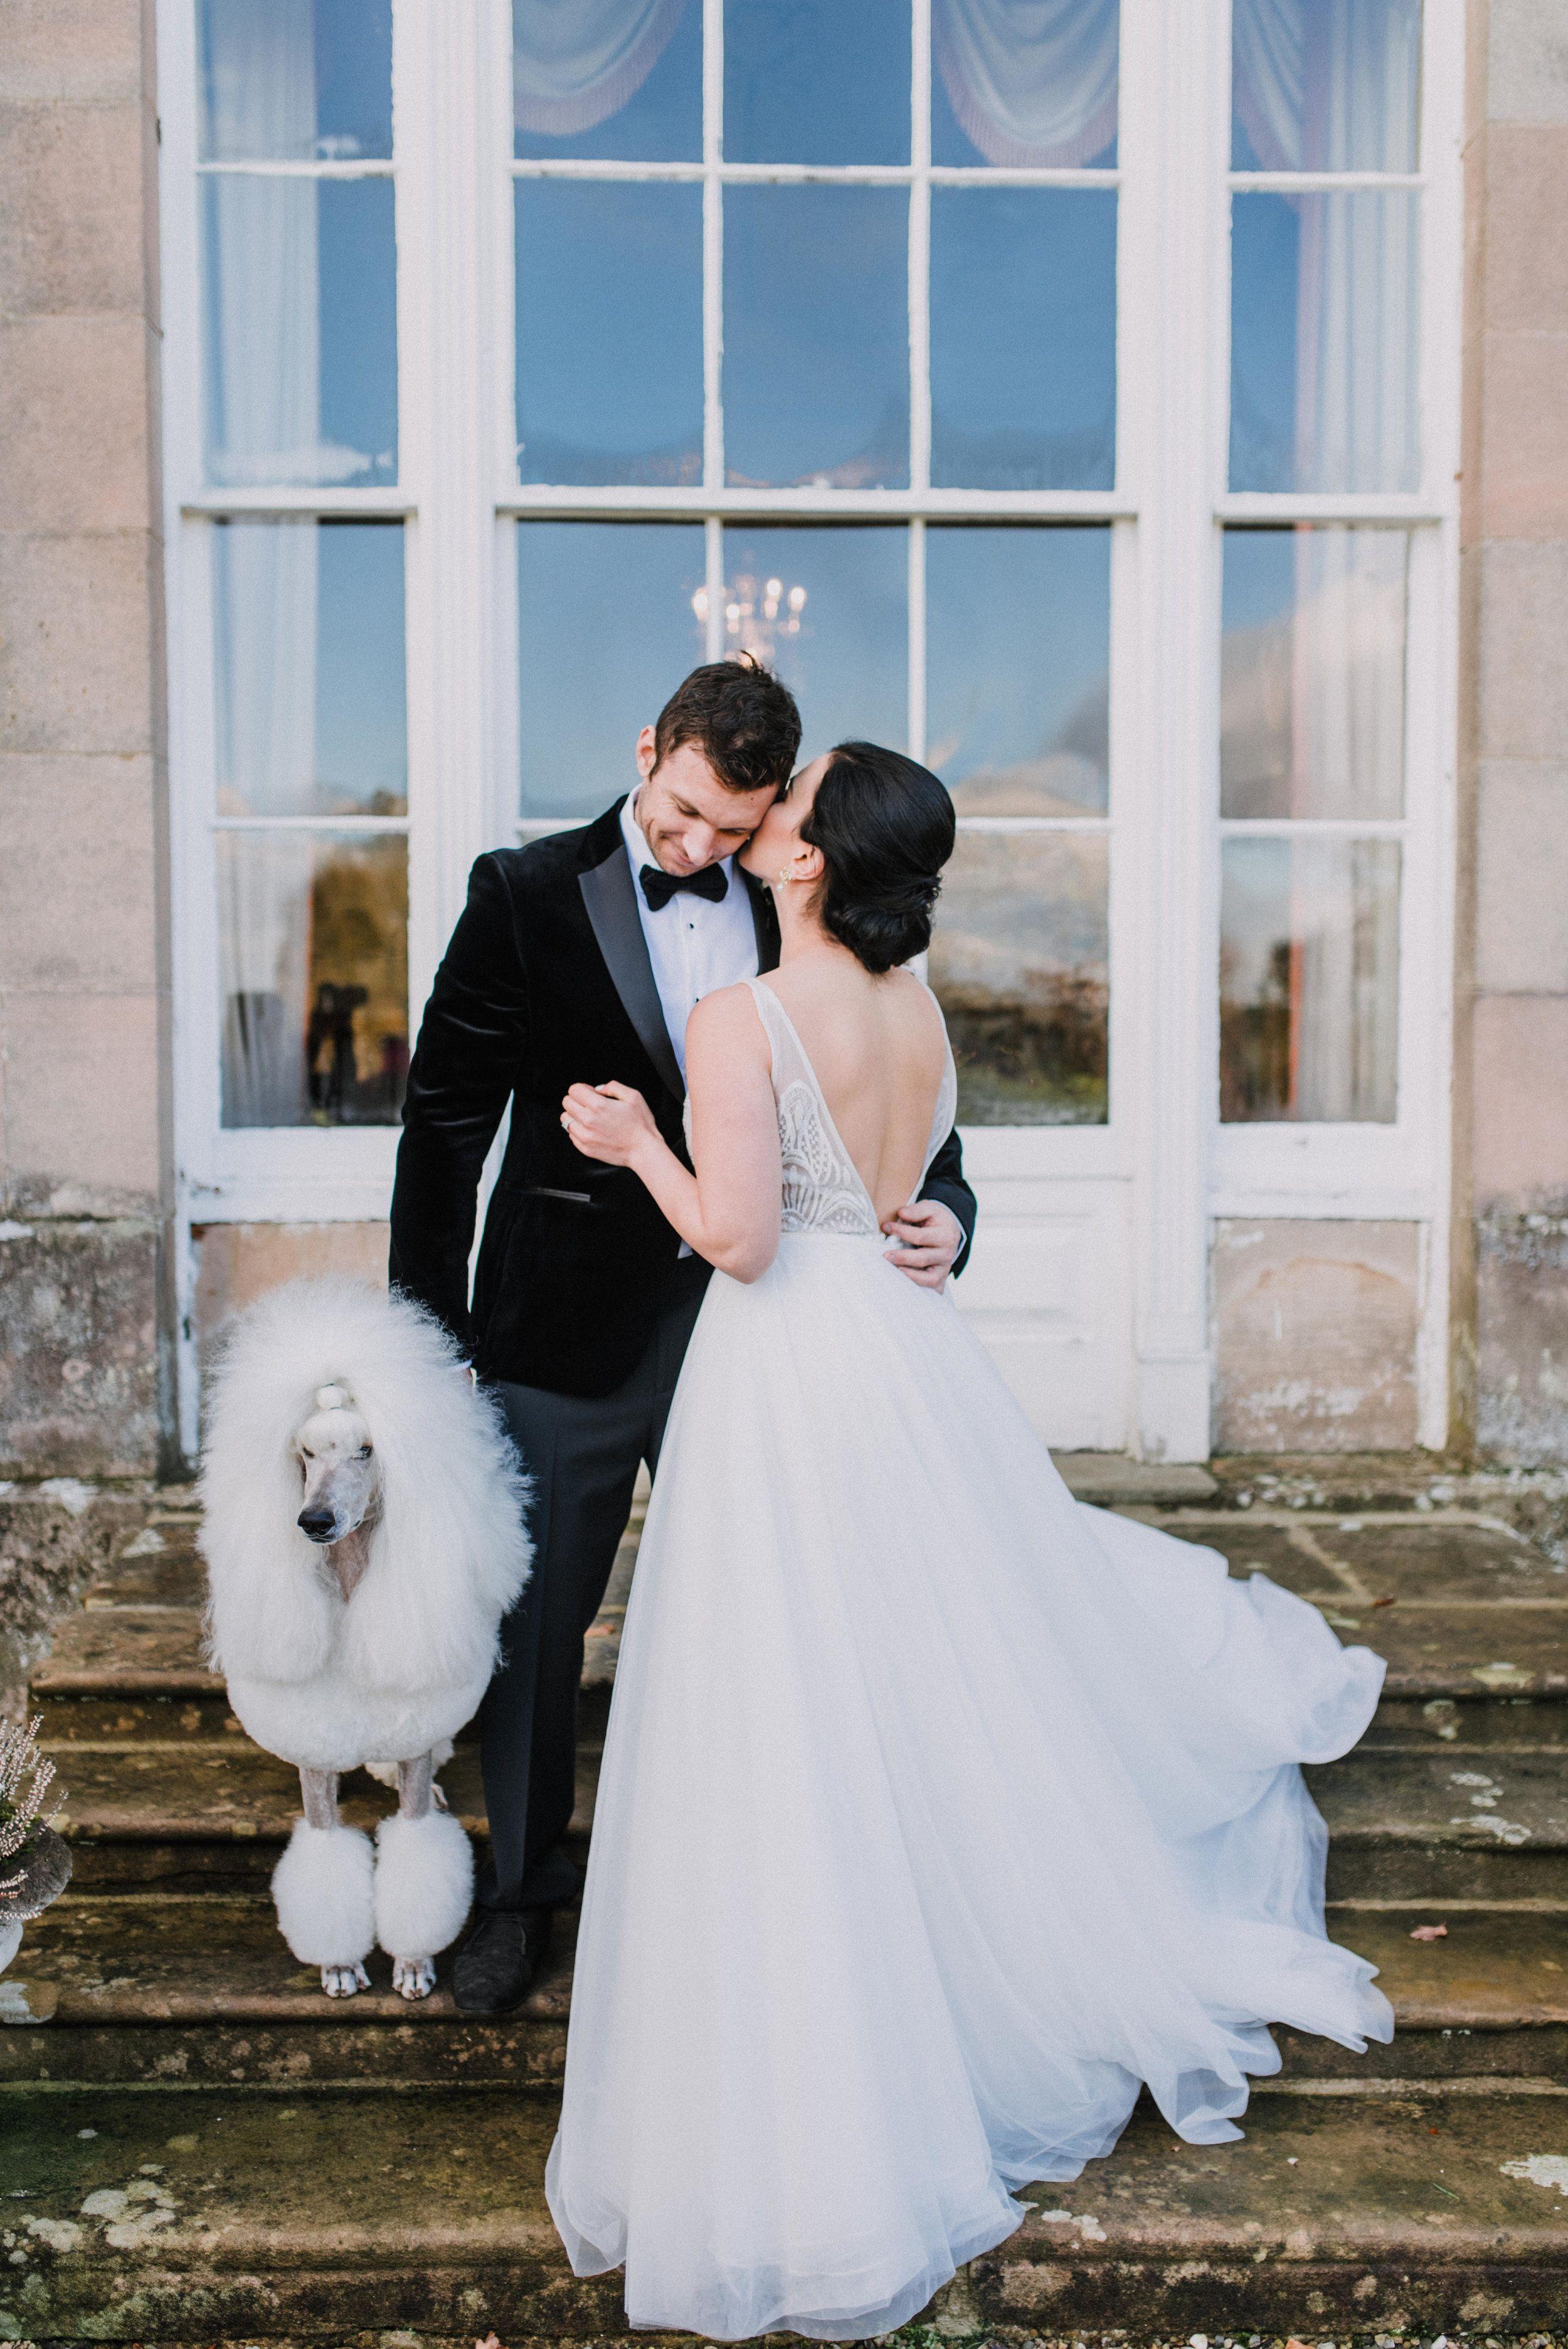 Drenagh house estate wedding northern ireland wedding